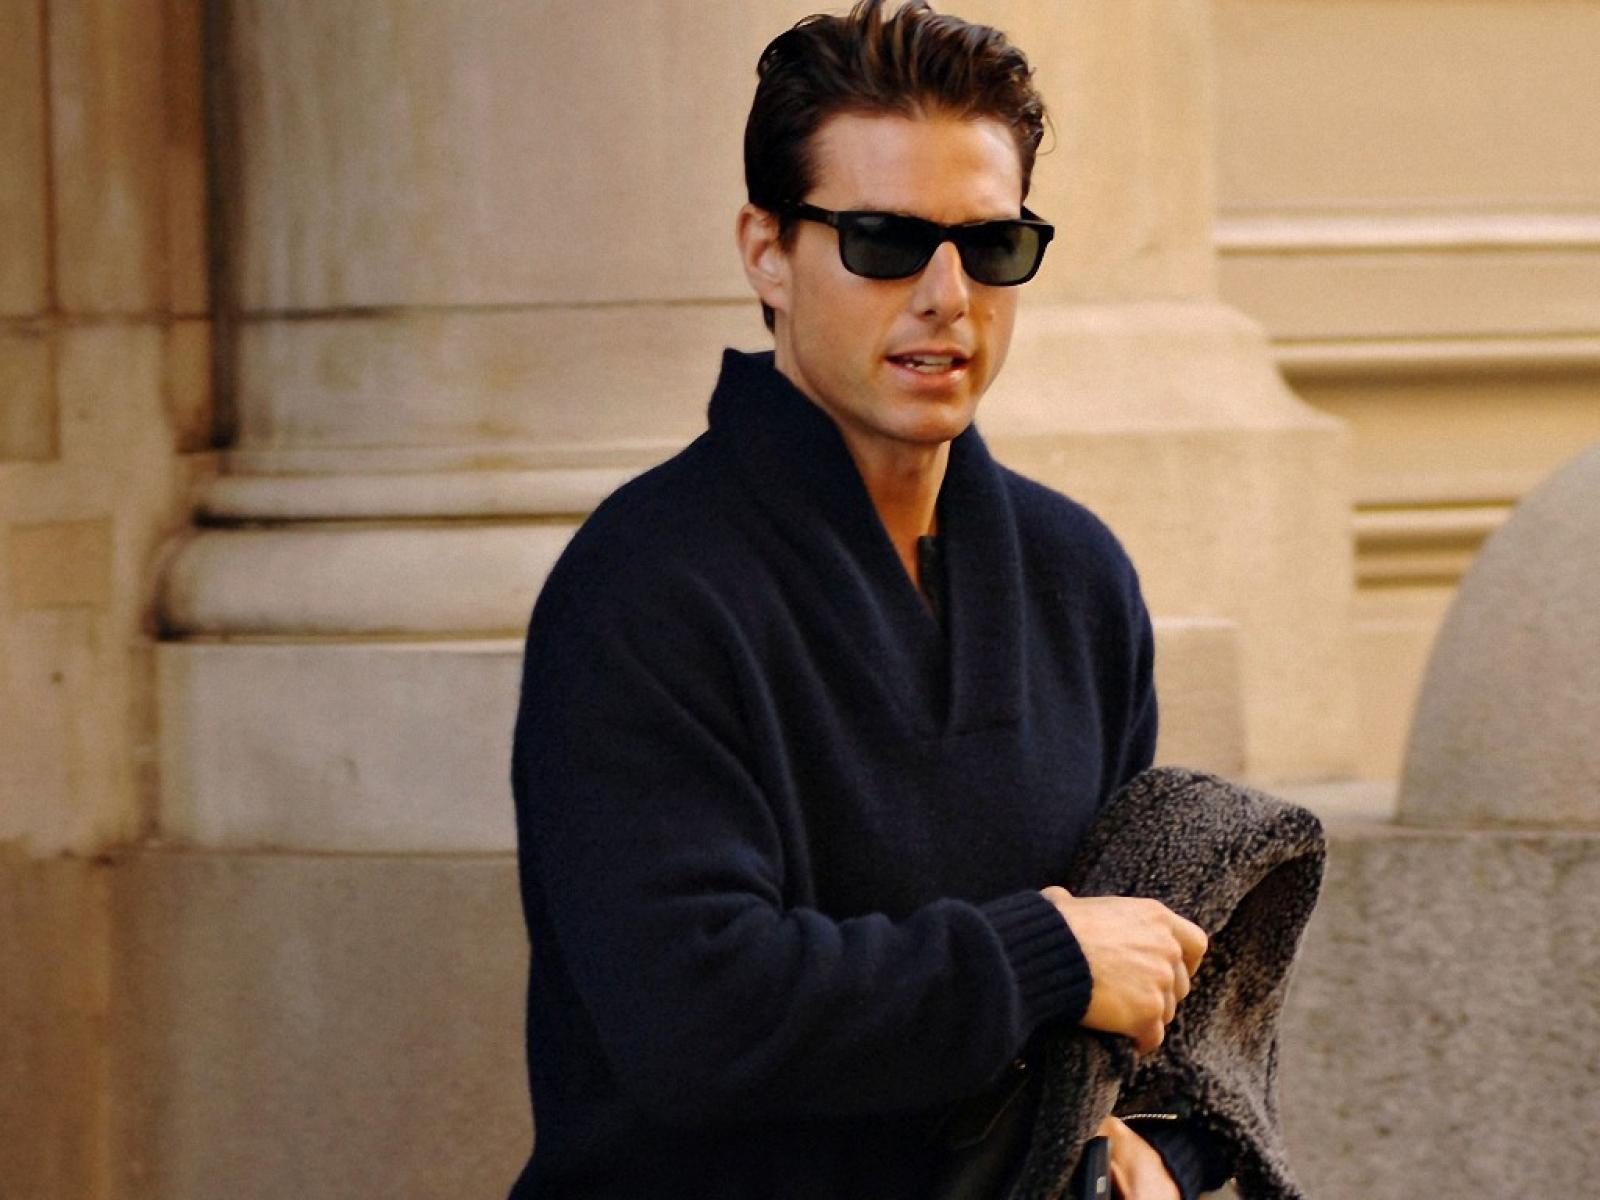 Fantastic Tom Cruise Hd Download Wallpaper